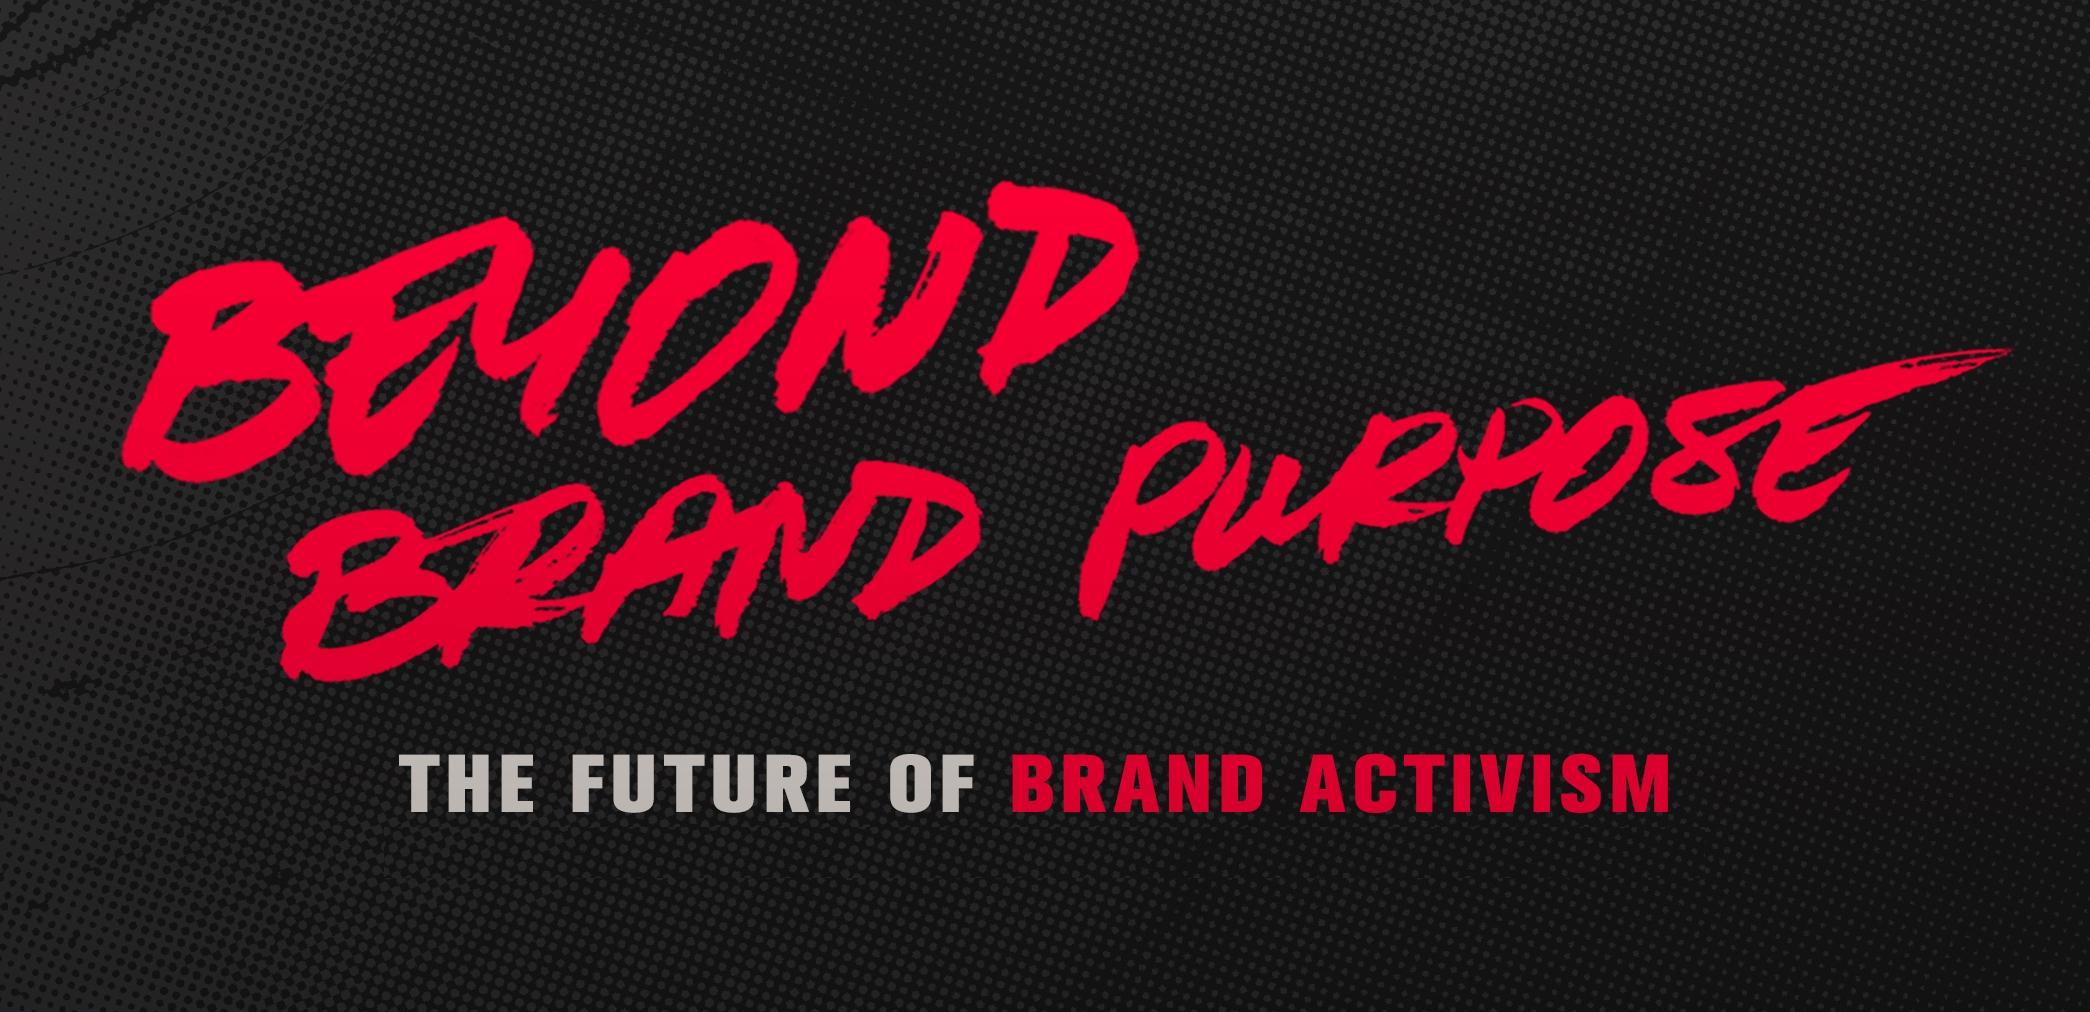 TCO Beyond Brand Purpose Event.jpg